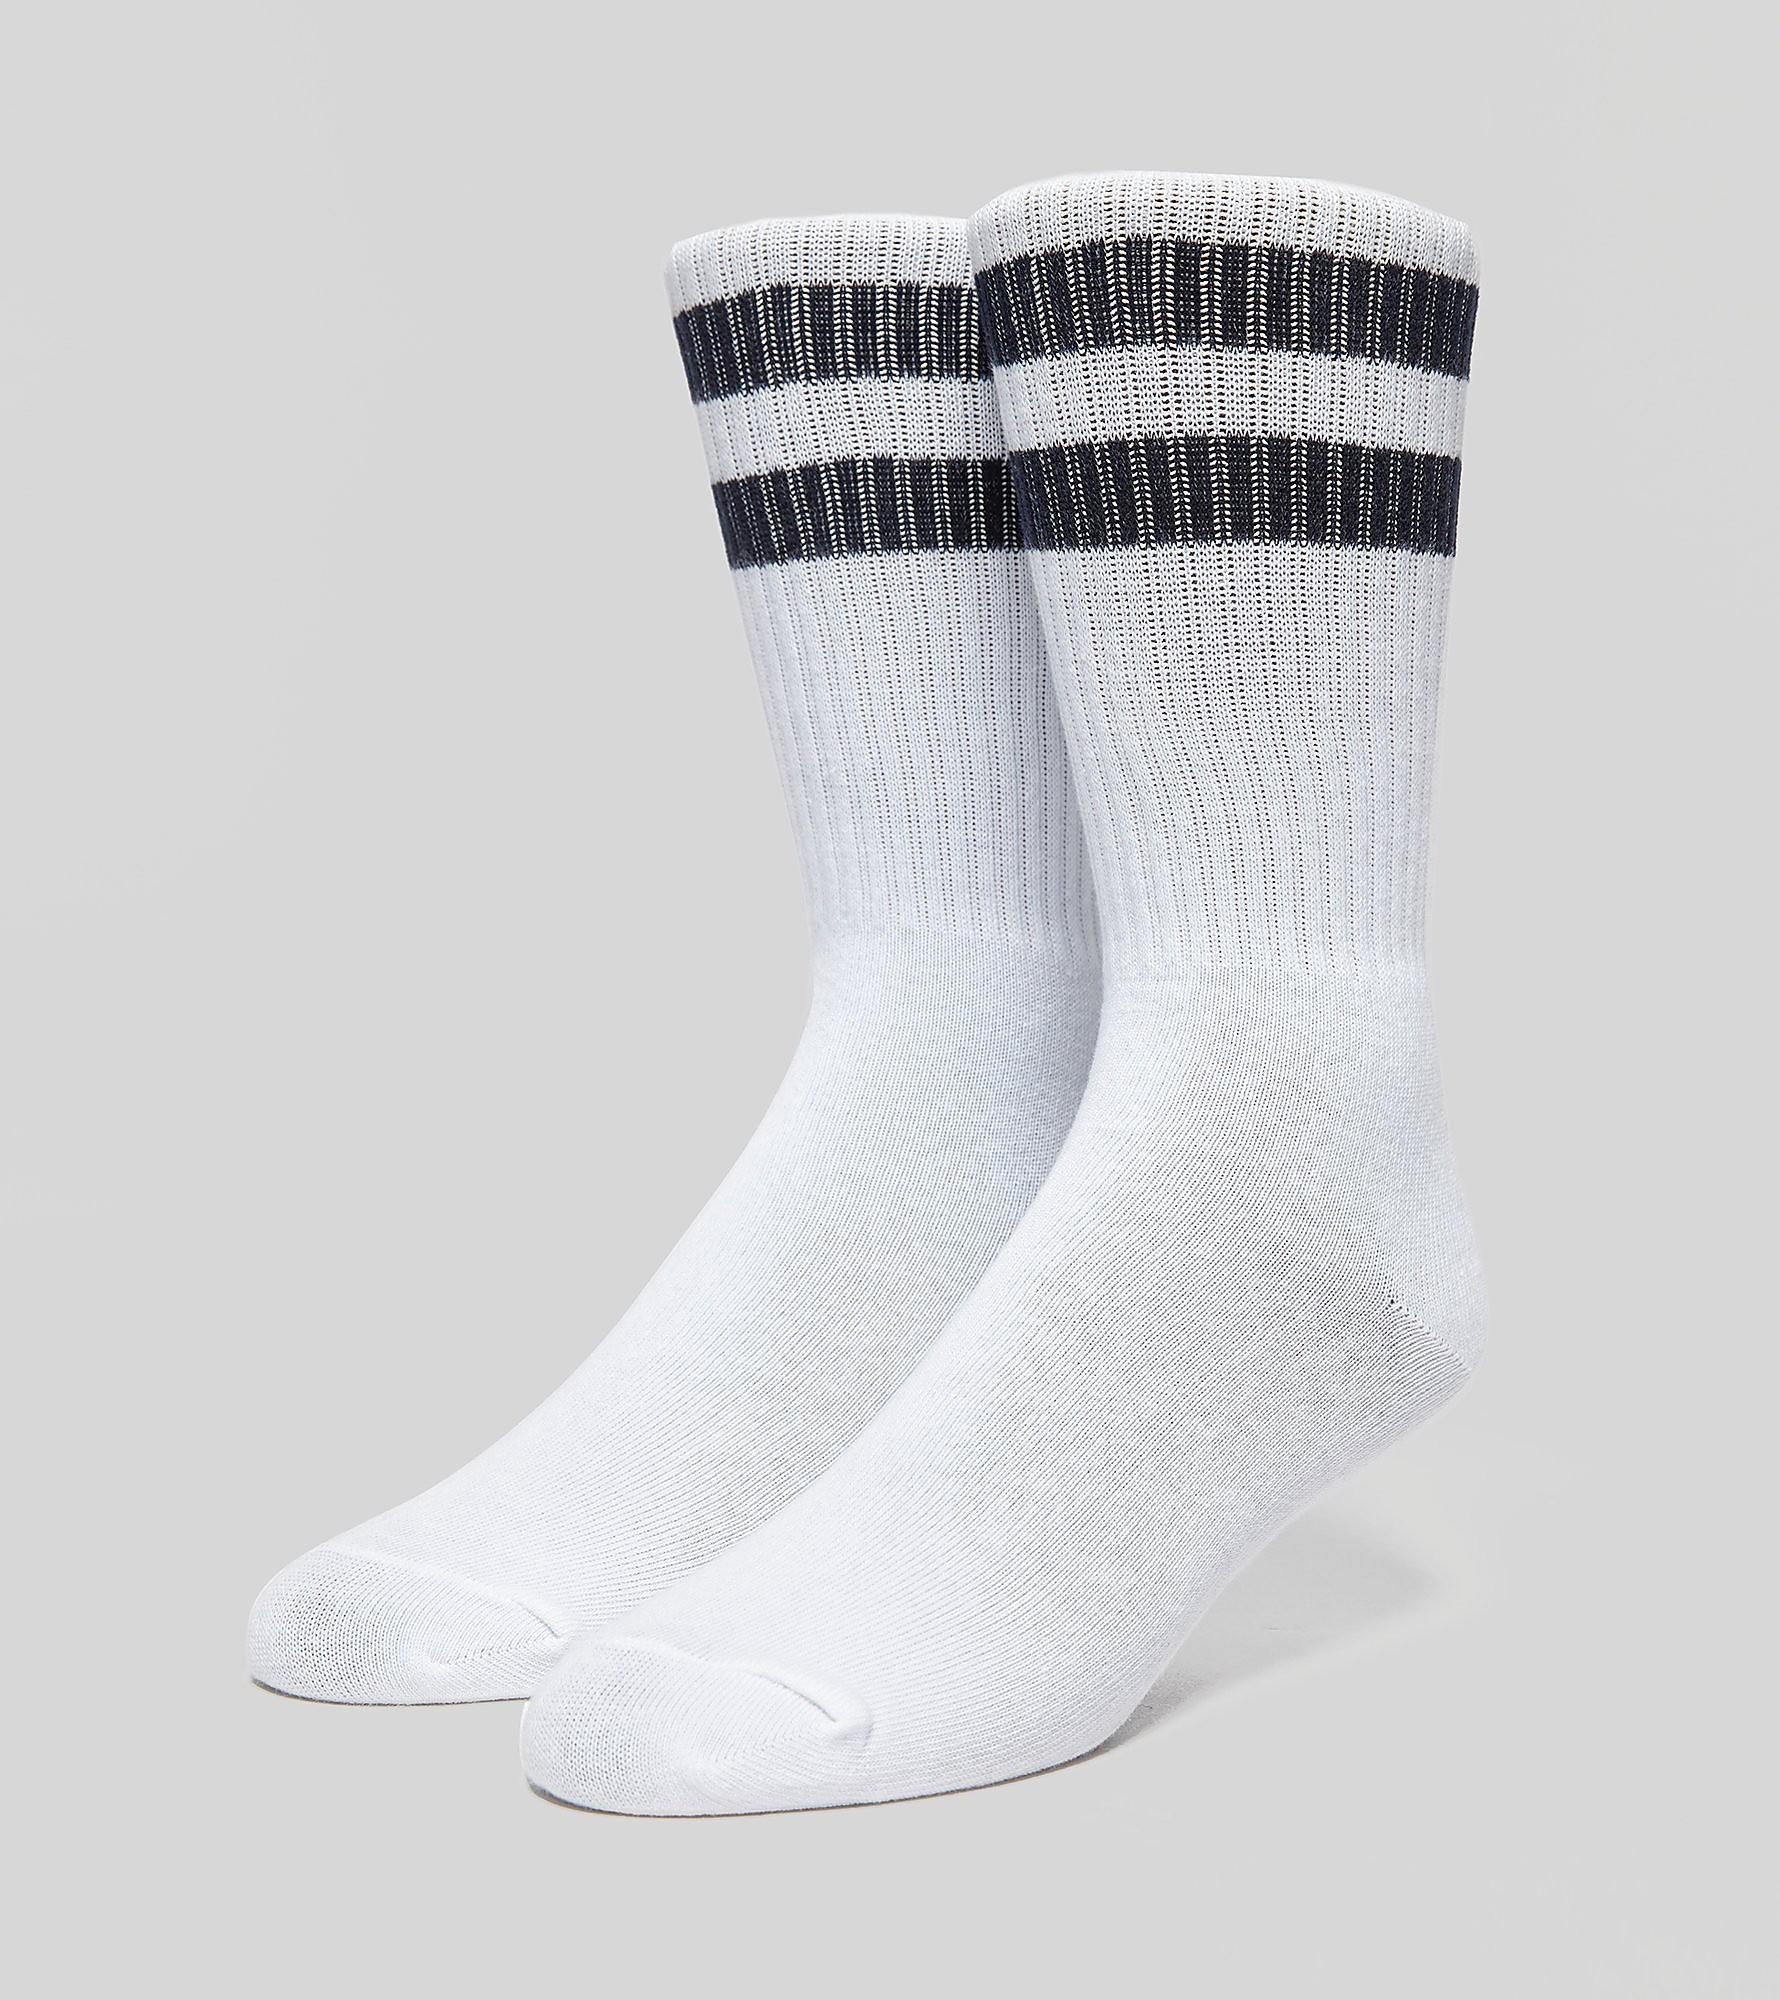 Carhartt WIP College Socks